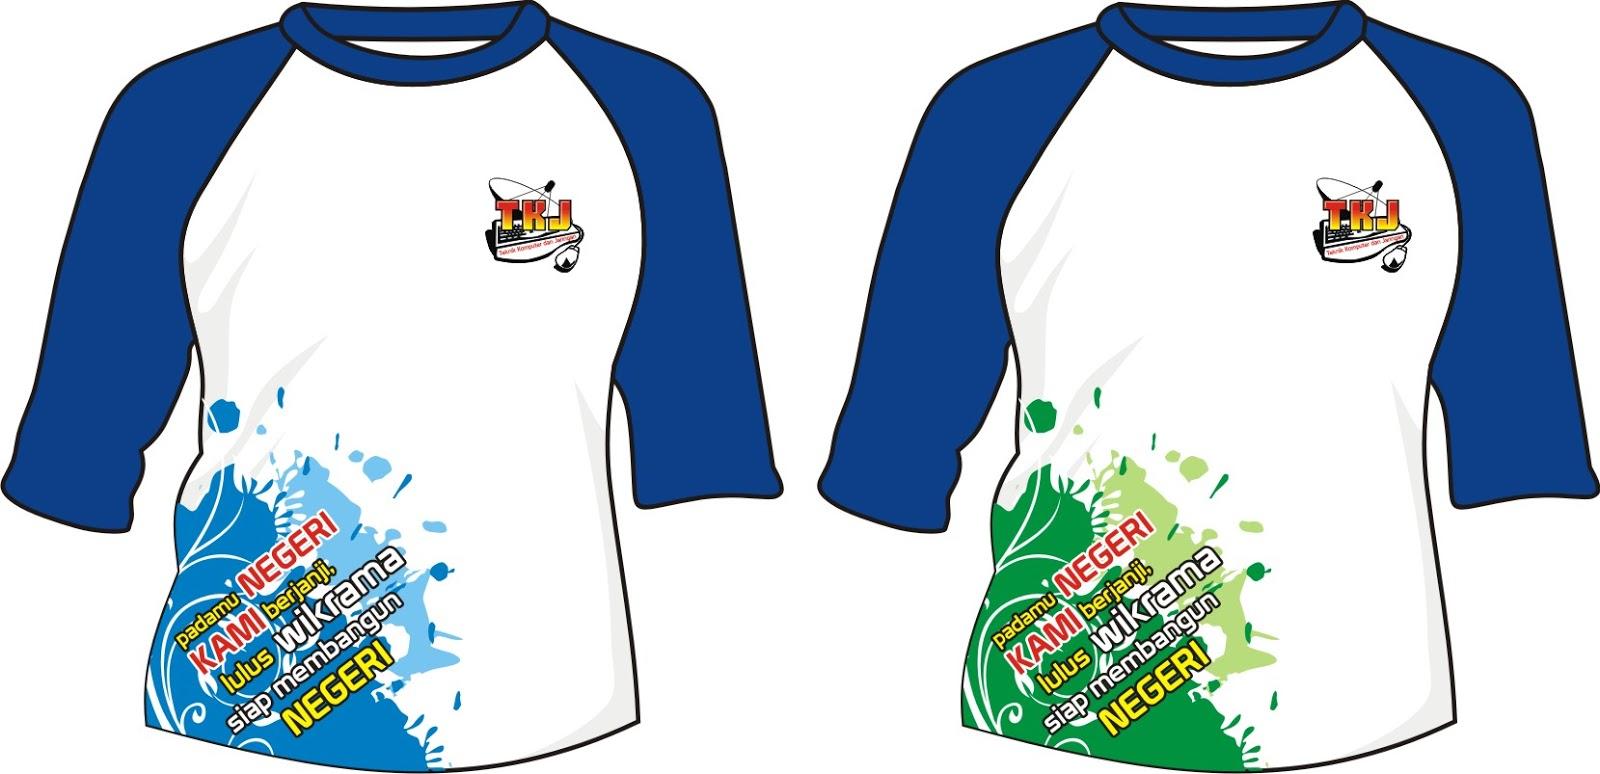 Desain t shirt racing -  Kaos Racing Desain Desain Kaos Contoh Apr Wallpapers 5 Shirt T 2016 Of Best Nfl